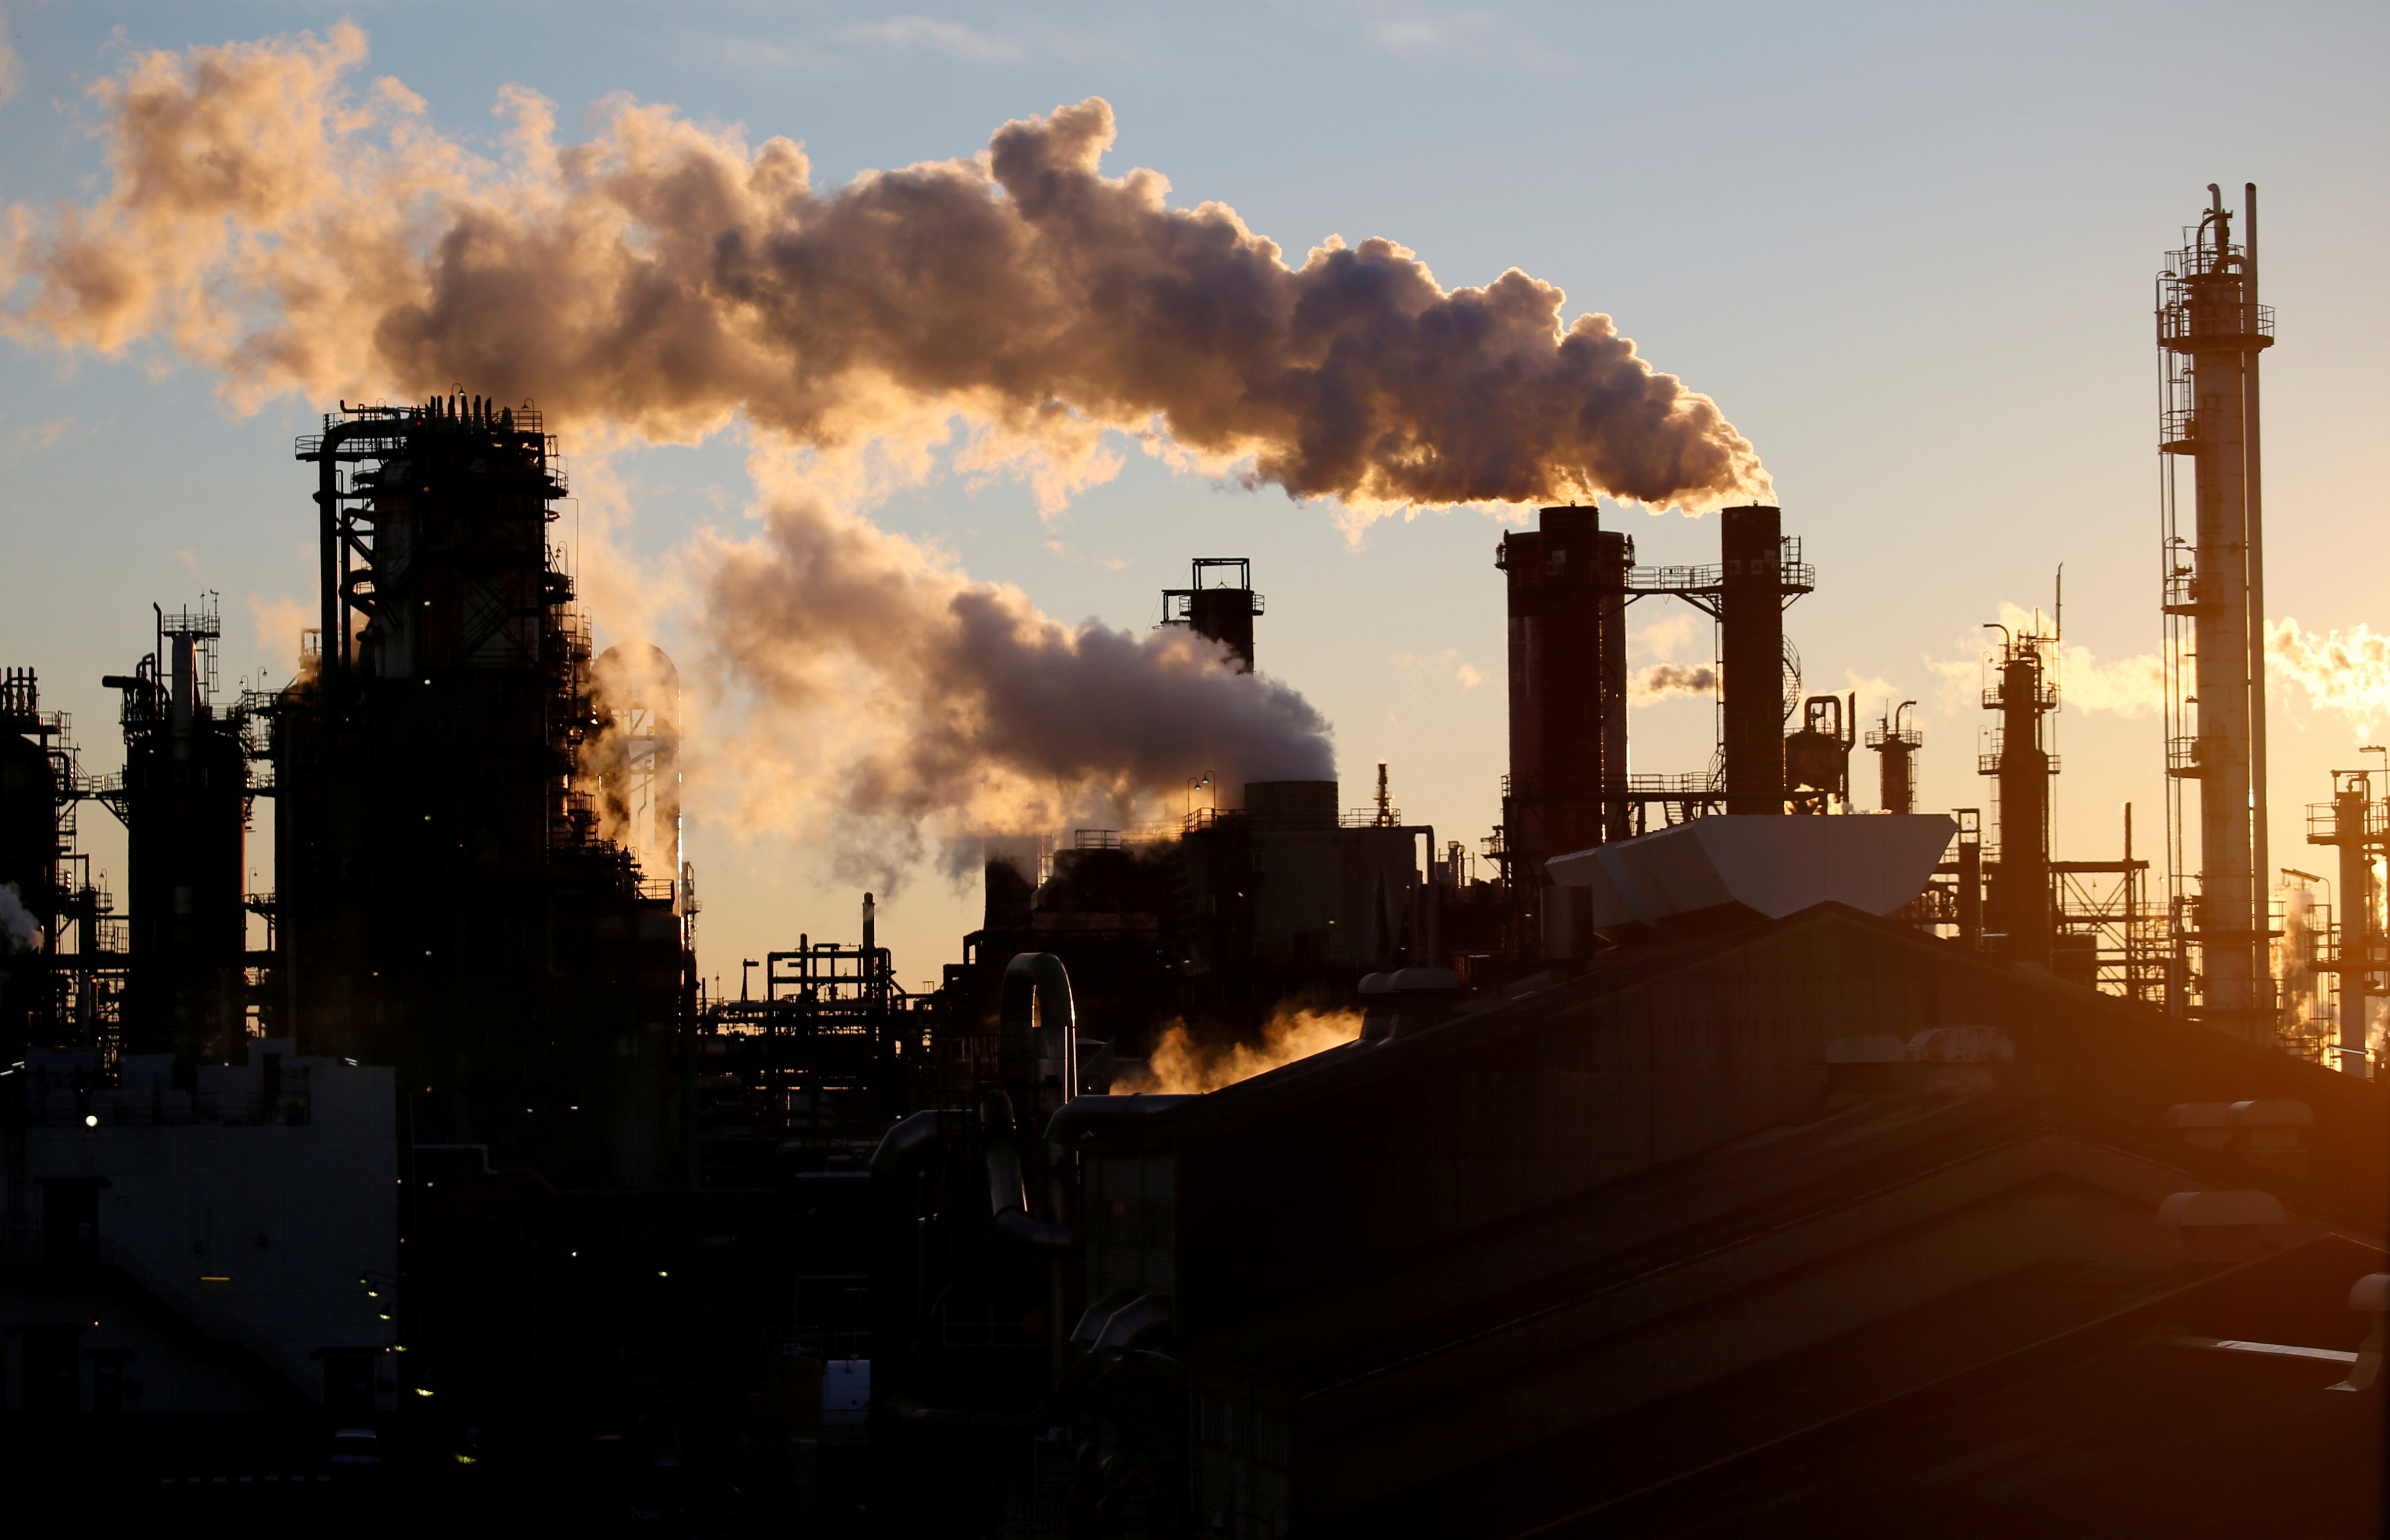 Smoke rises from a factory in front of Mount Fuji during the sunset at Keihin industrial zone in Kawasaki, Japan January 16, 2017. REUTERS/Toru Hanai/File Photo